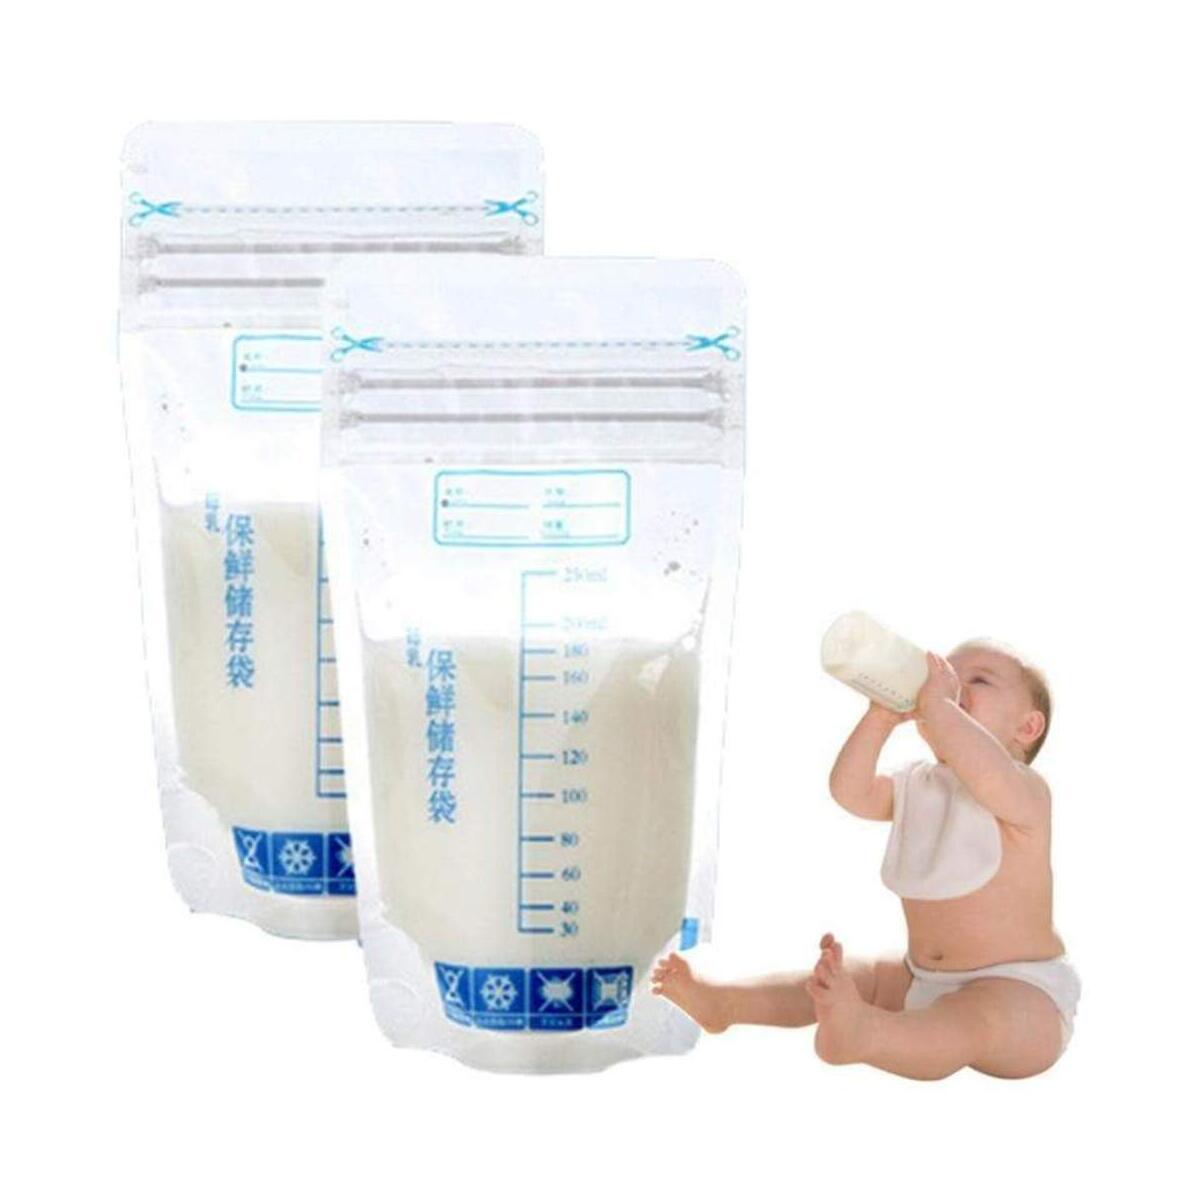 Breast Milk Storage Bags - Self Standing, Freezer Safe, Leak Proof Zip Top Closure, Pre Sterilized, Marked Measurements Food Pouches